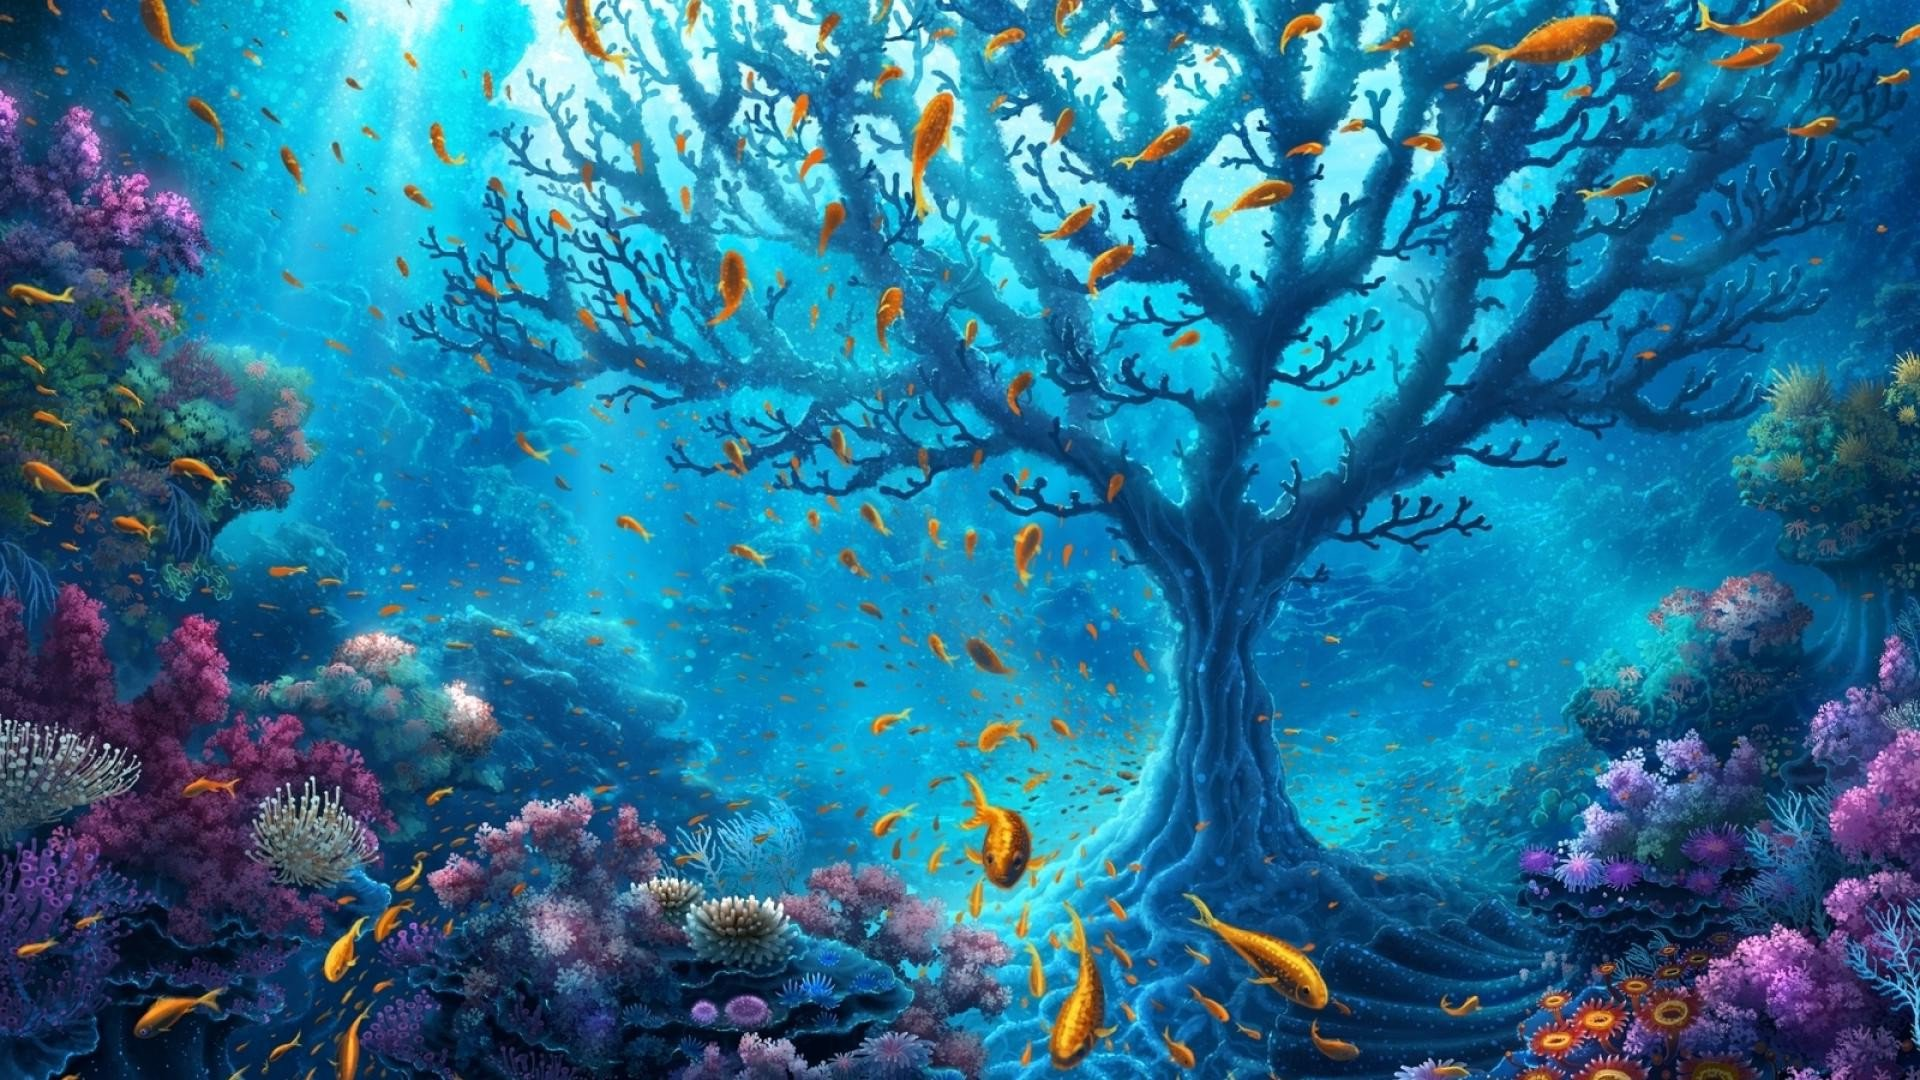 Free Download Girl Wallpaper For 360x640 2048x1152 Underwater World 2048x1152 Resolution Hd 4k